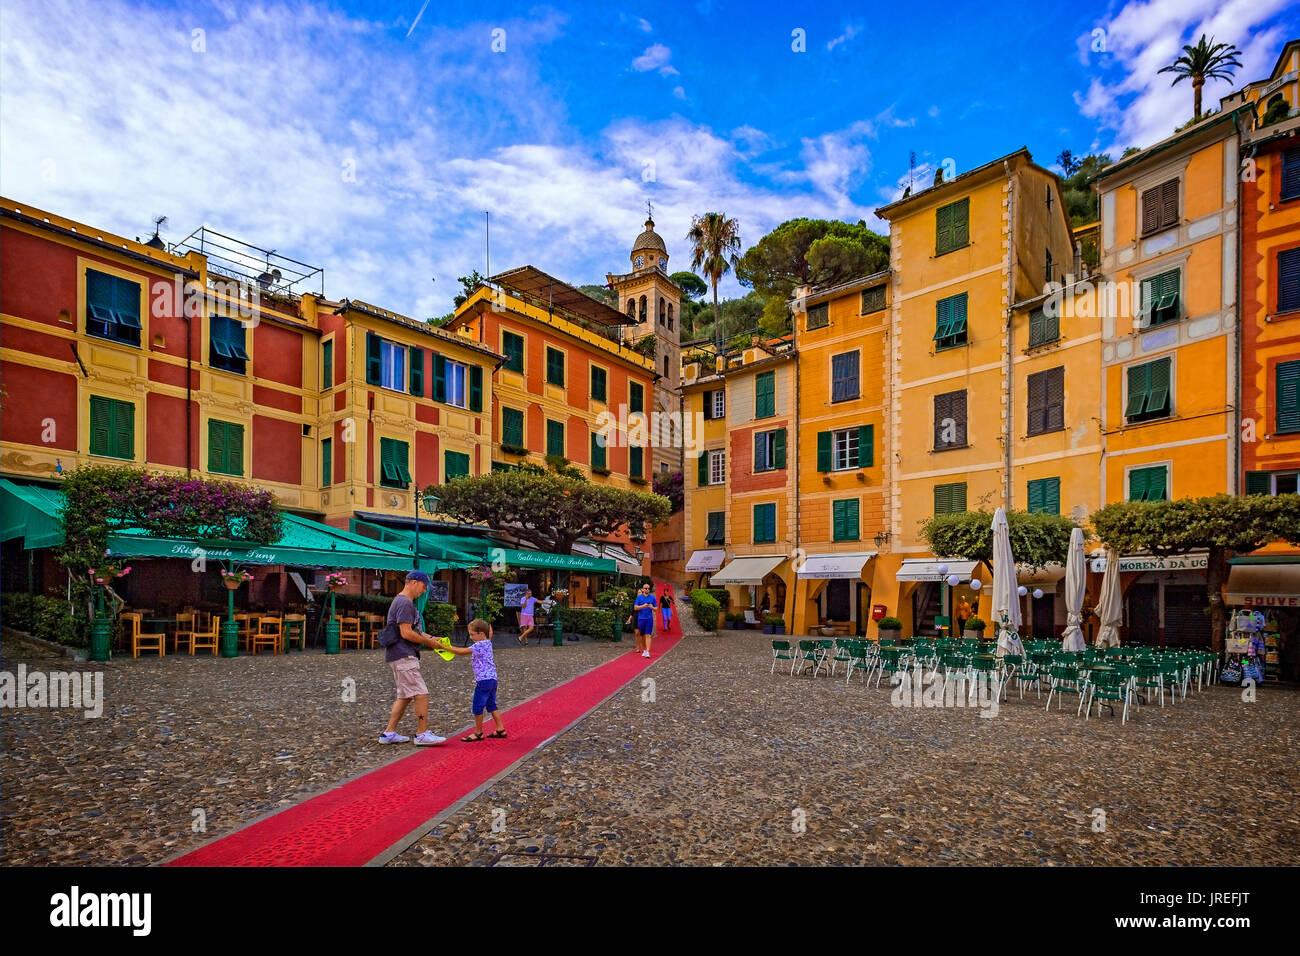 Italy Liguria Mount of Portofino Park - Portofino - the Piazzetta  ( red carpet - the longest red carpet in the - Stock Image